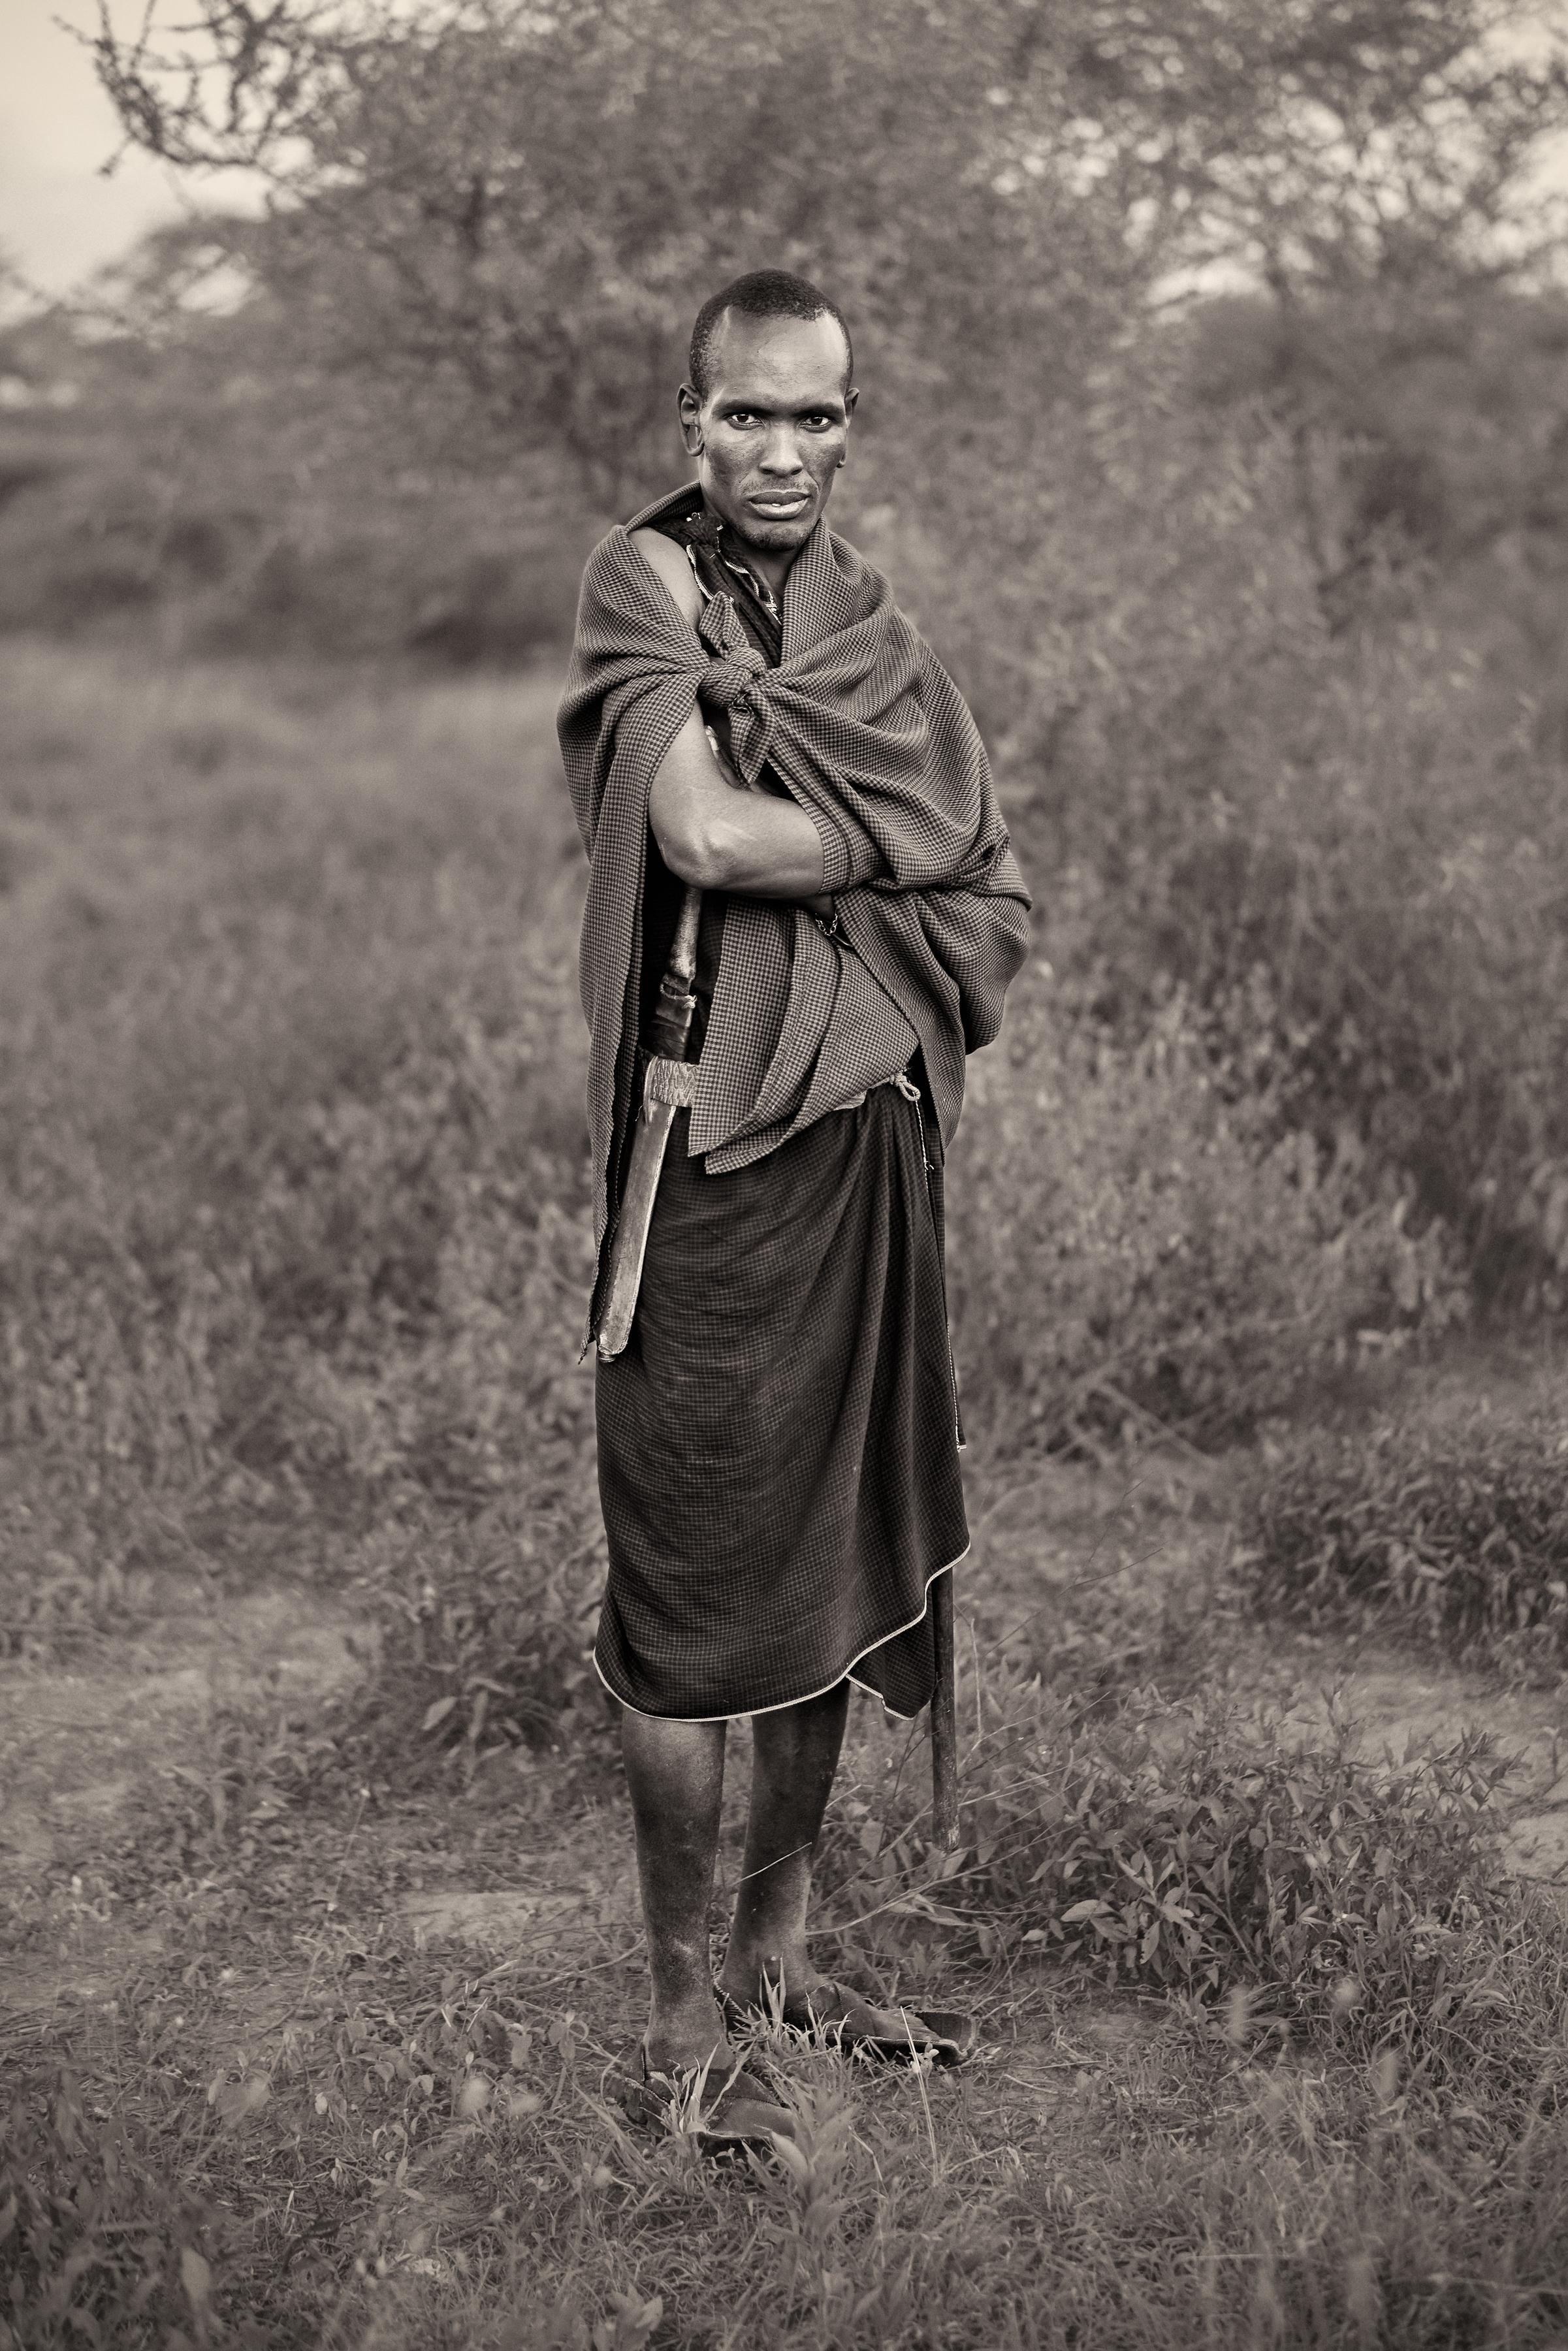 Ilan Wittenberg, from The Maasai People